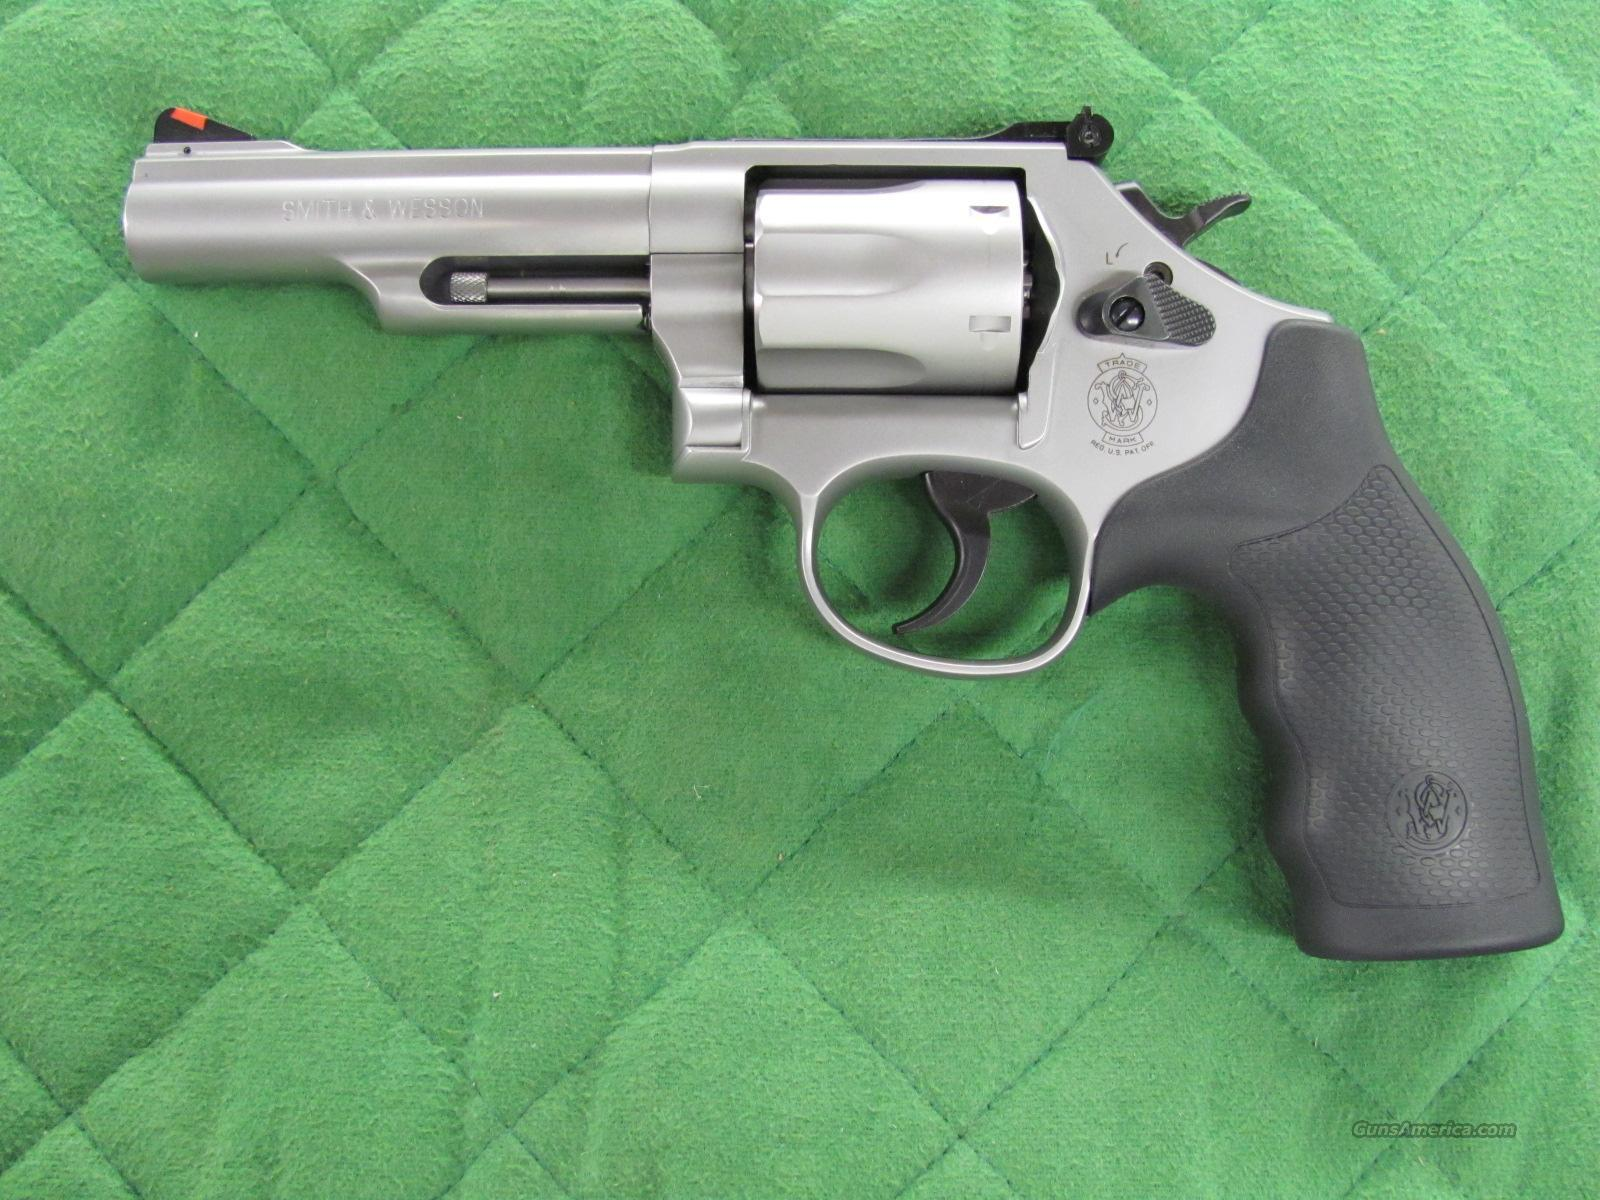 Smith & Wesson Model 66 .357 Mag 4 1/4 Inch  *NO CC FEES* 162662  Guns > Pistols > Smith & Wesson Revolvers > Full Frame Revolver